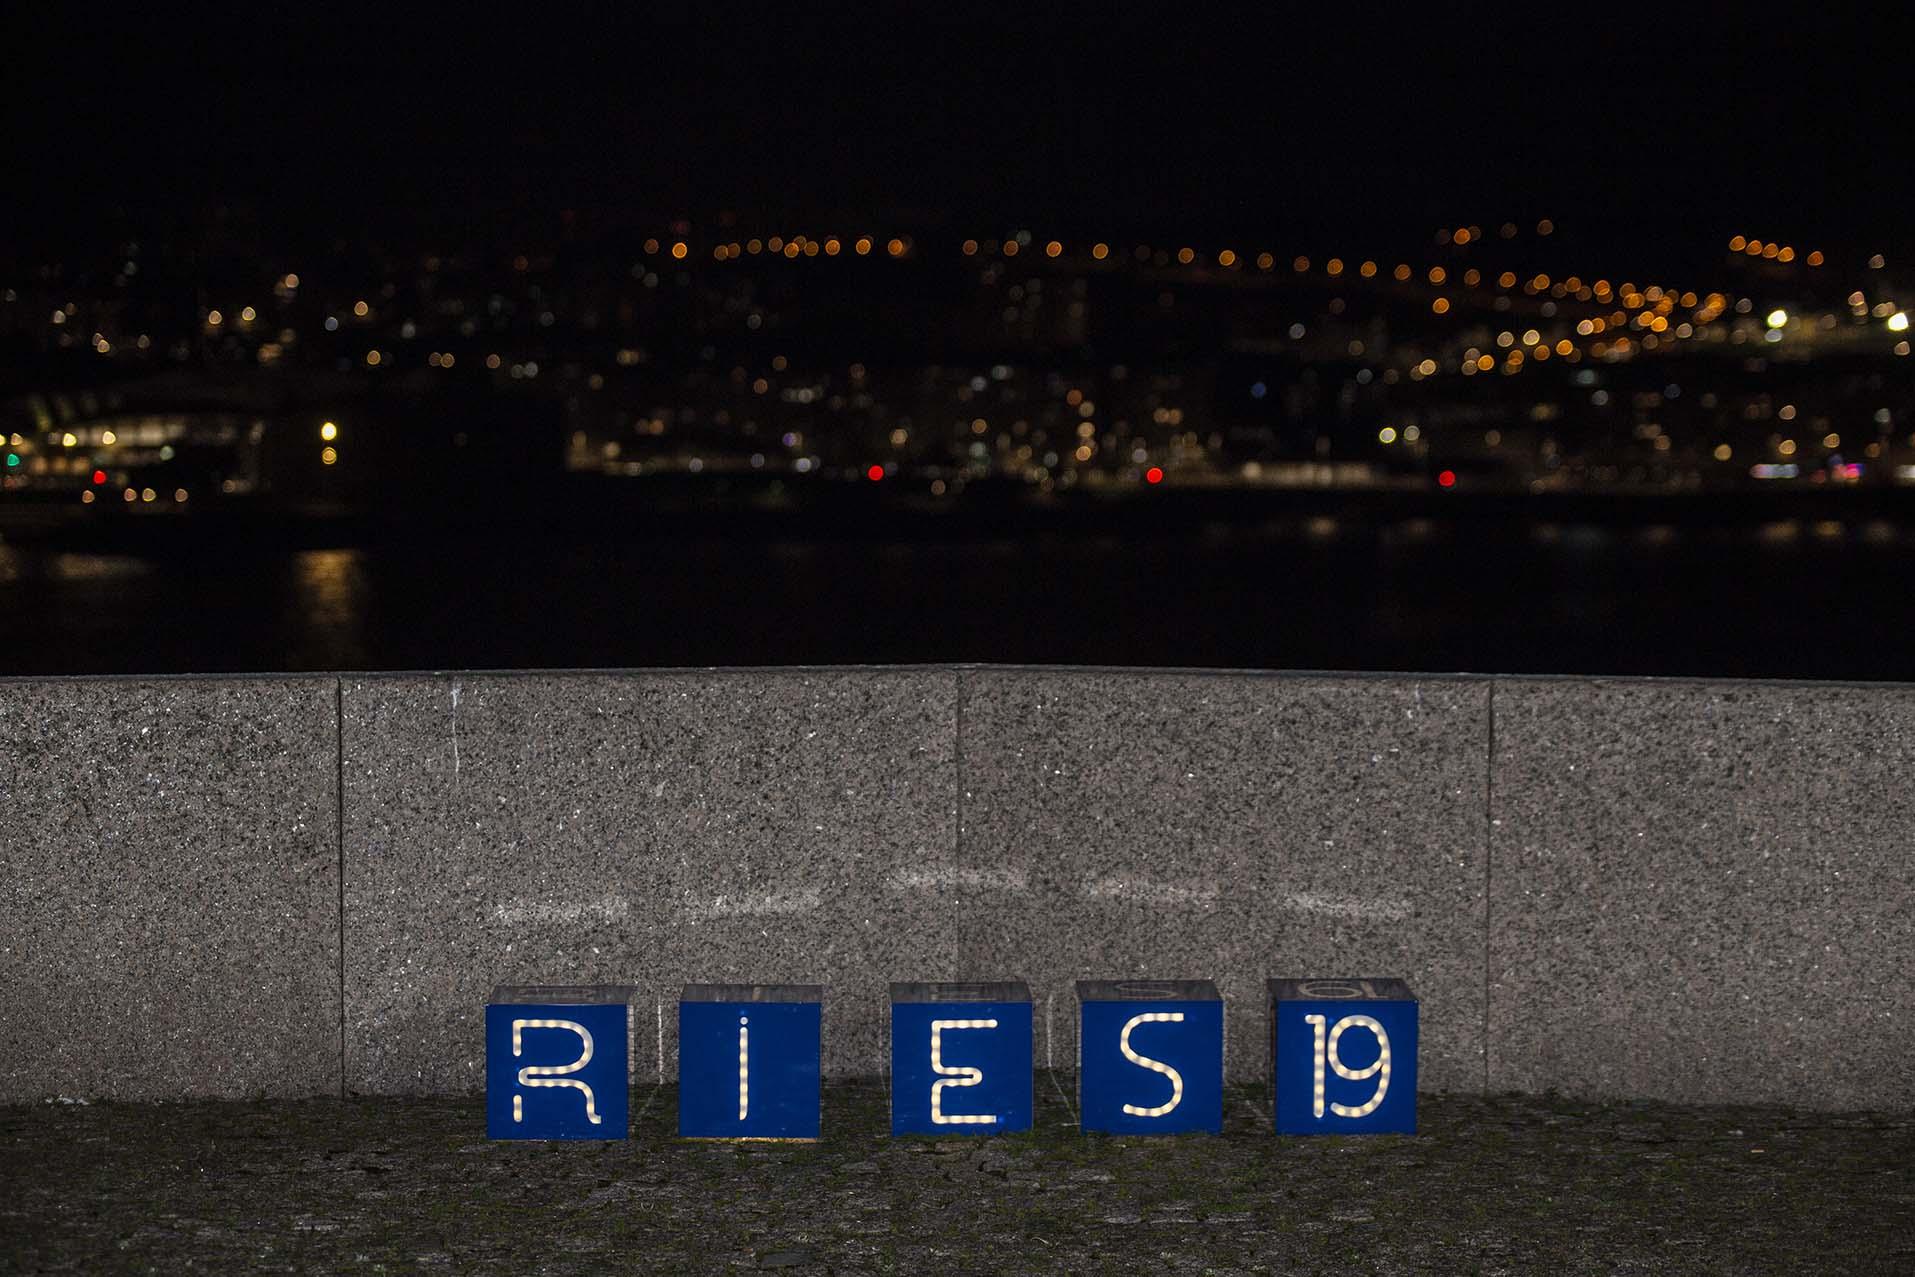 IV Fórum RIES19 - DOMUS